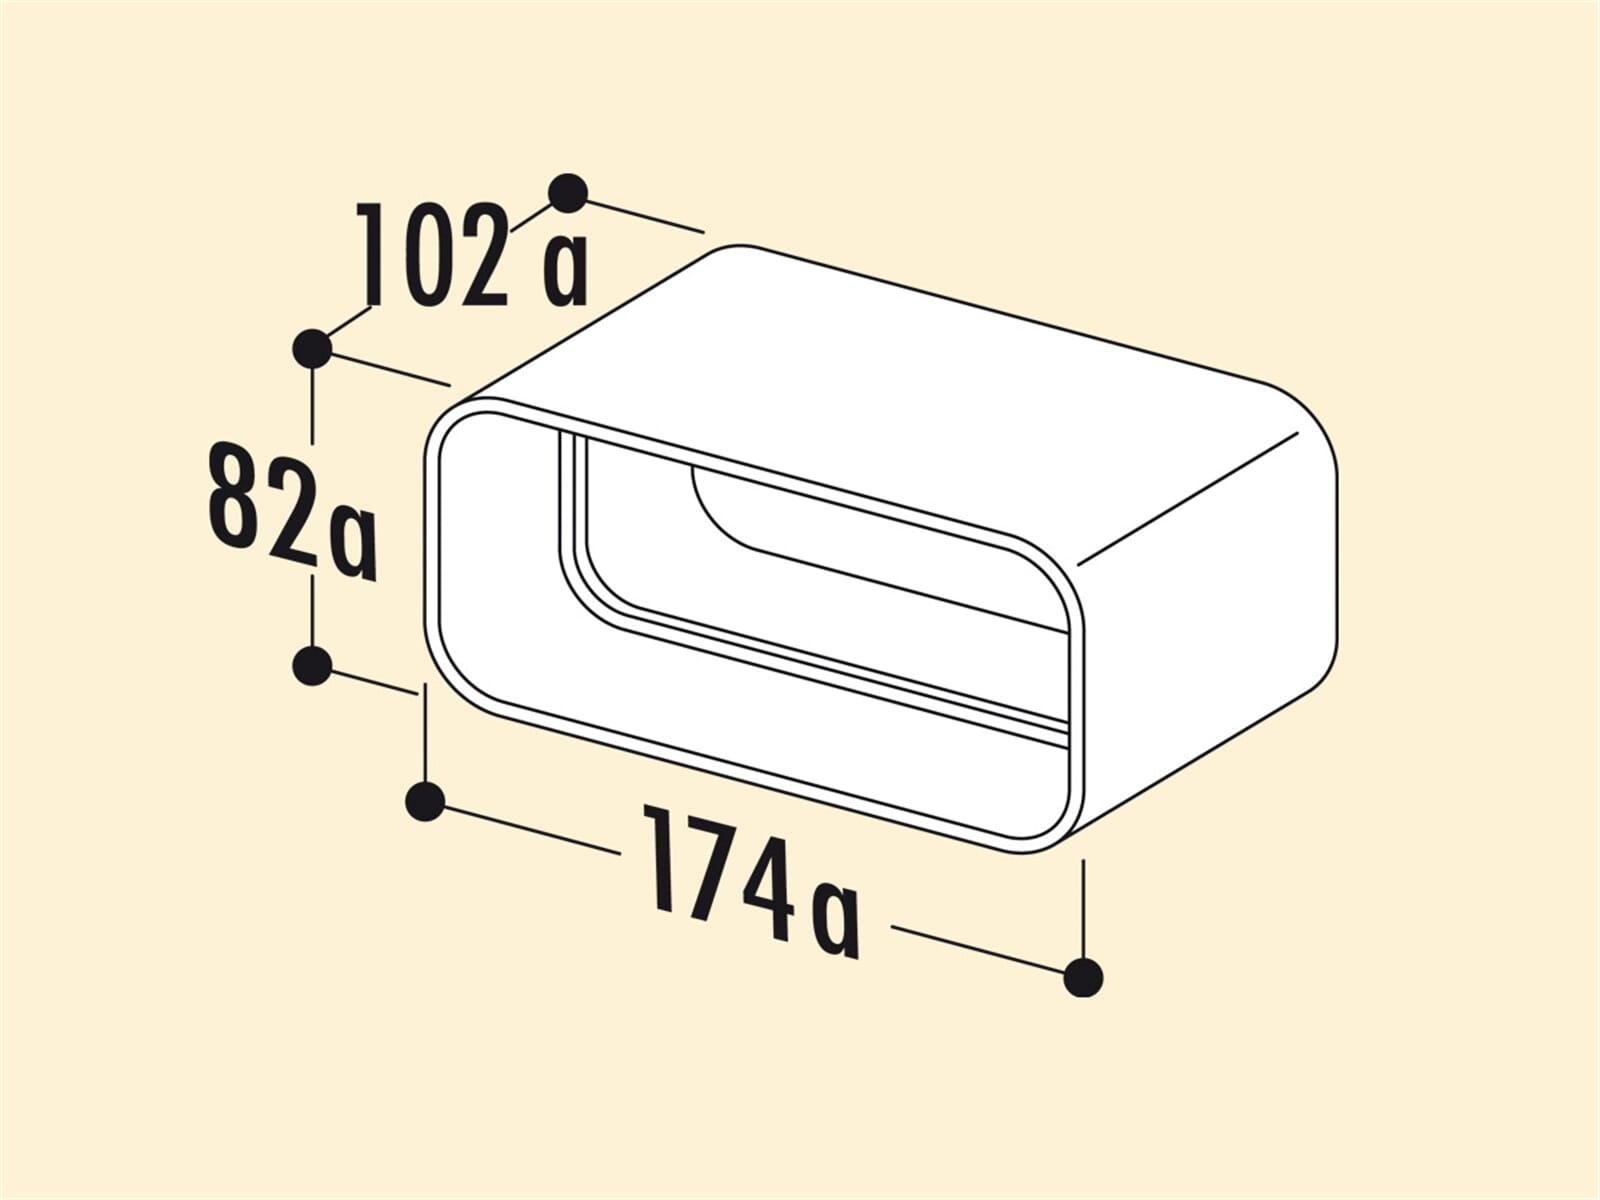 Compair 403.3.005 MF-RVB Rohrverbinder